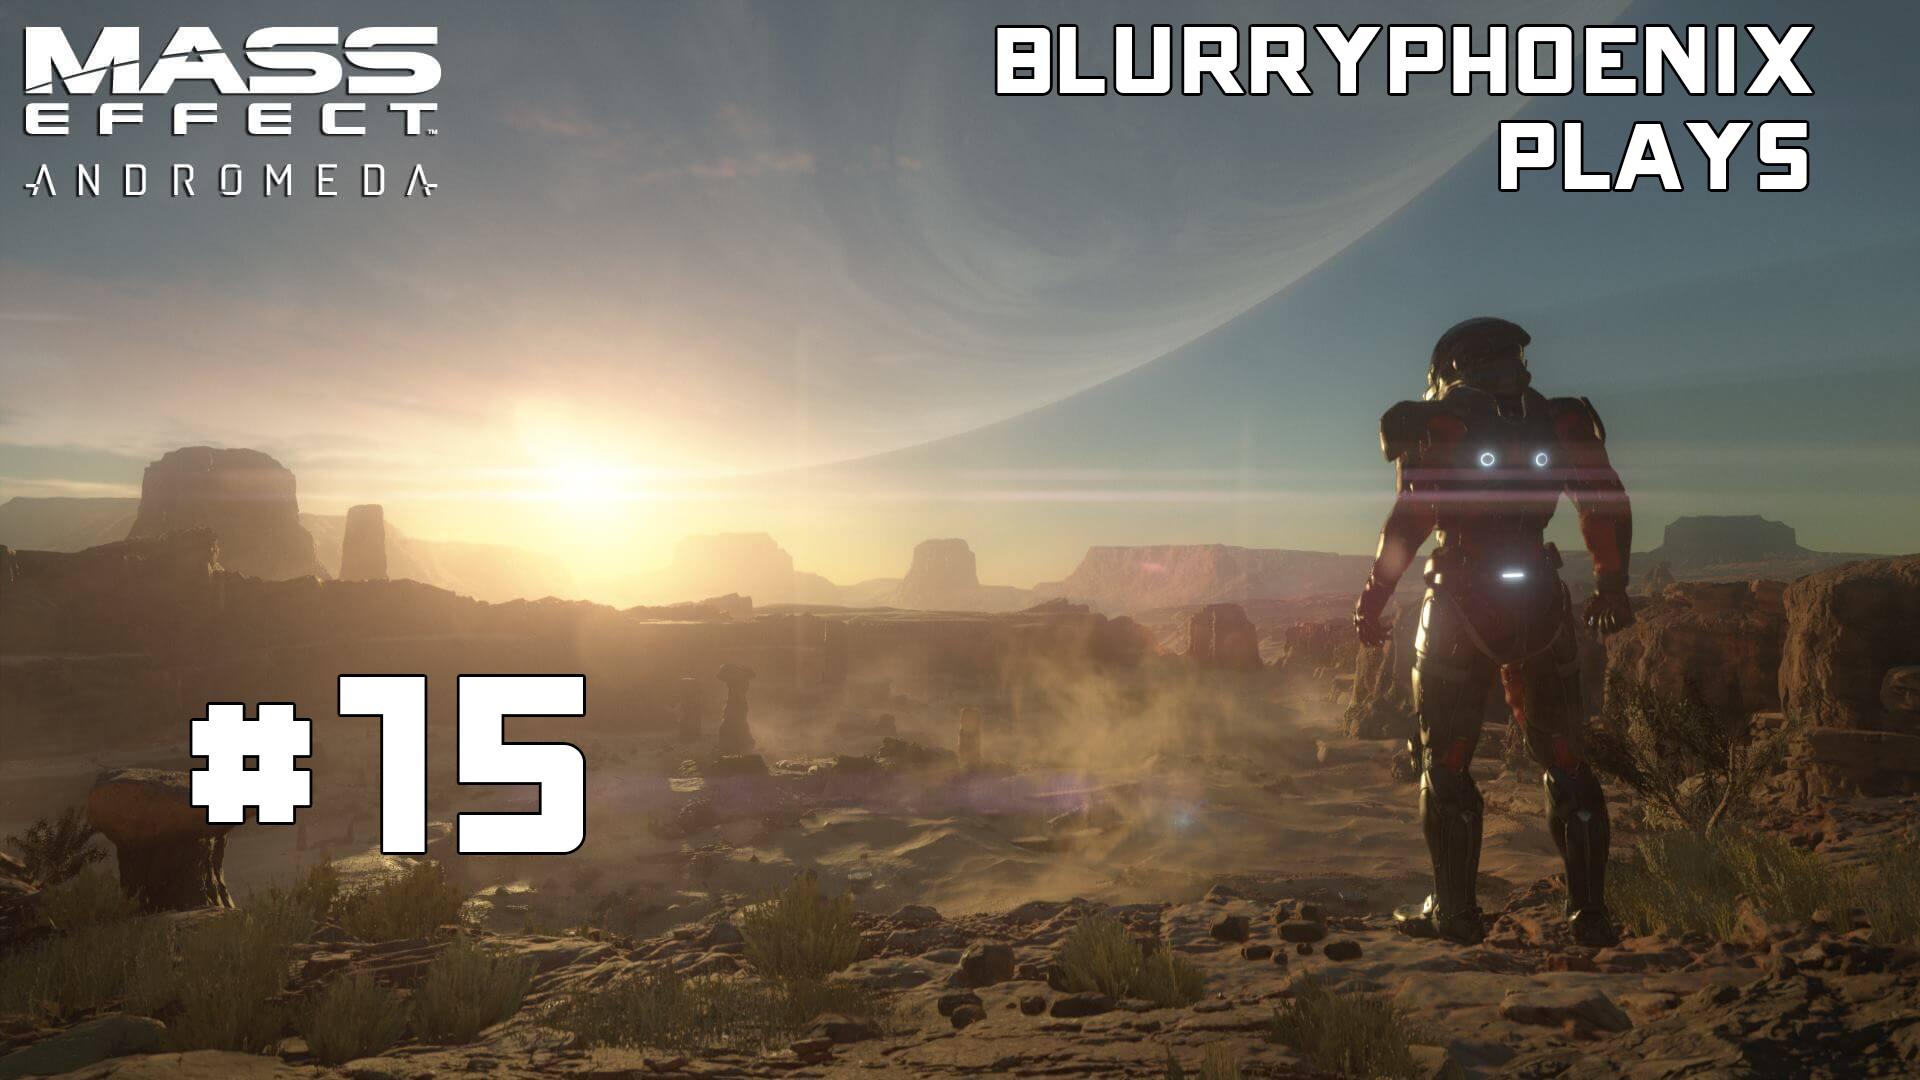 BlurryPhoenix Streams: Mass Effect – Andromeda (Pt. 15)